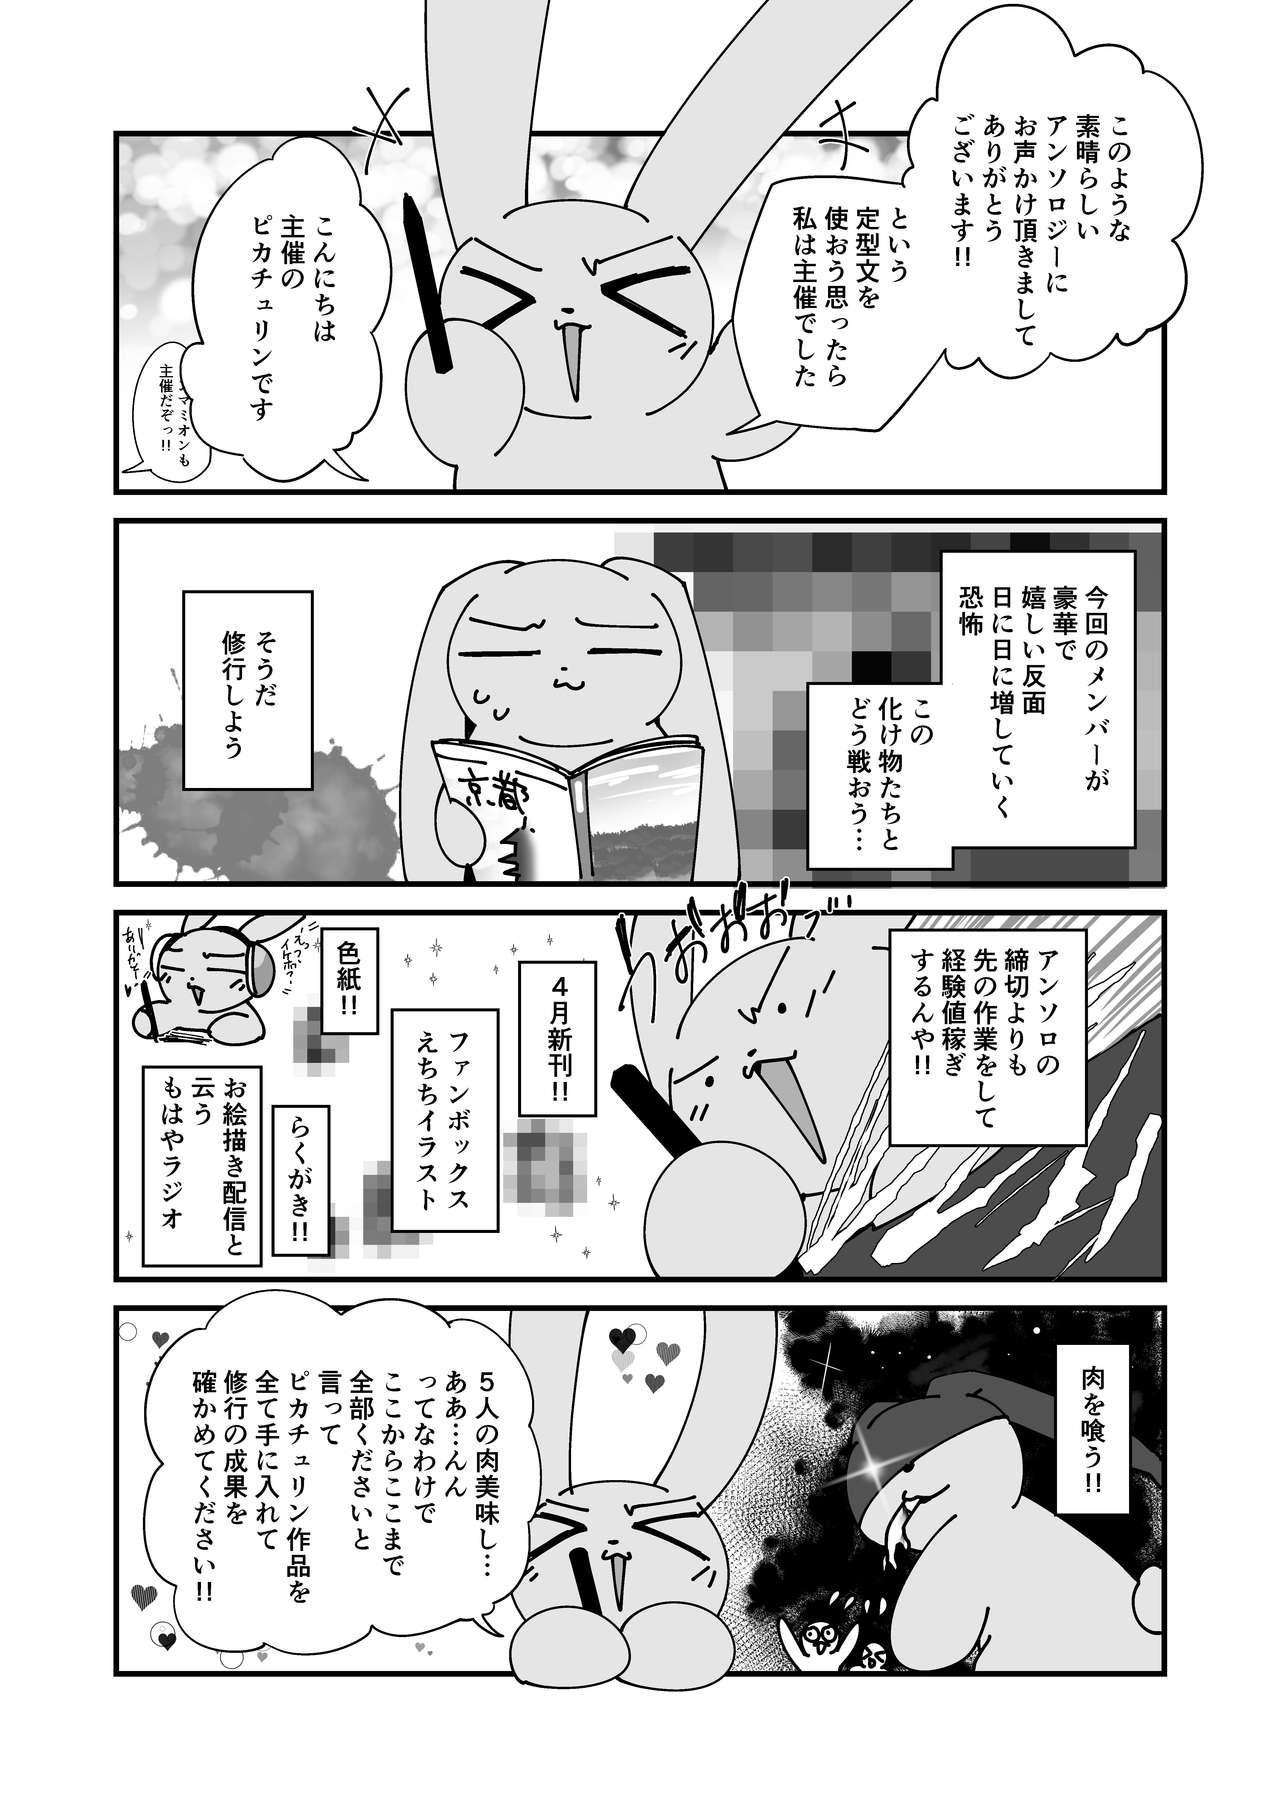 Shota Sextet Vol. 1 23